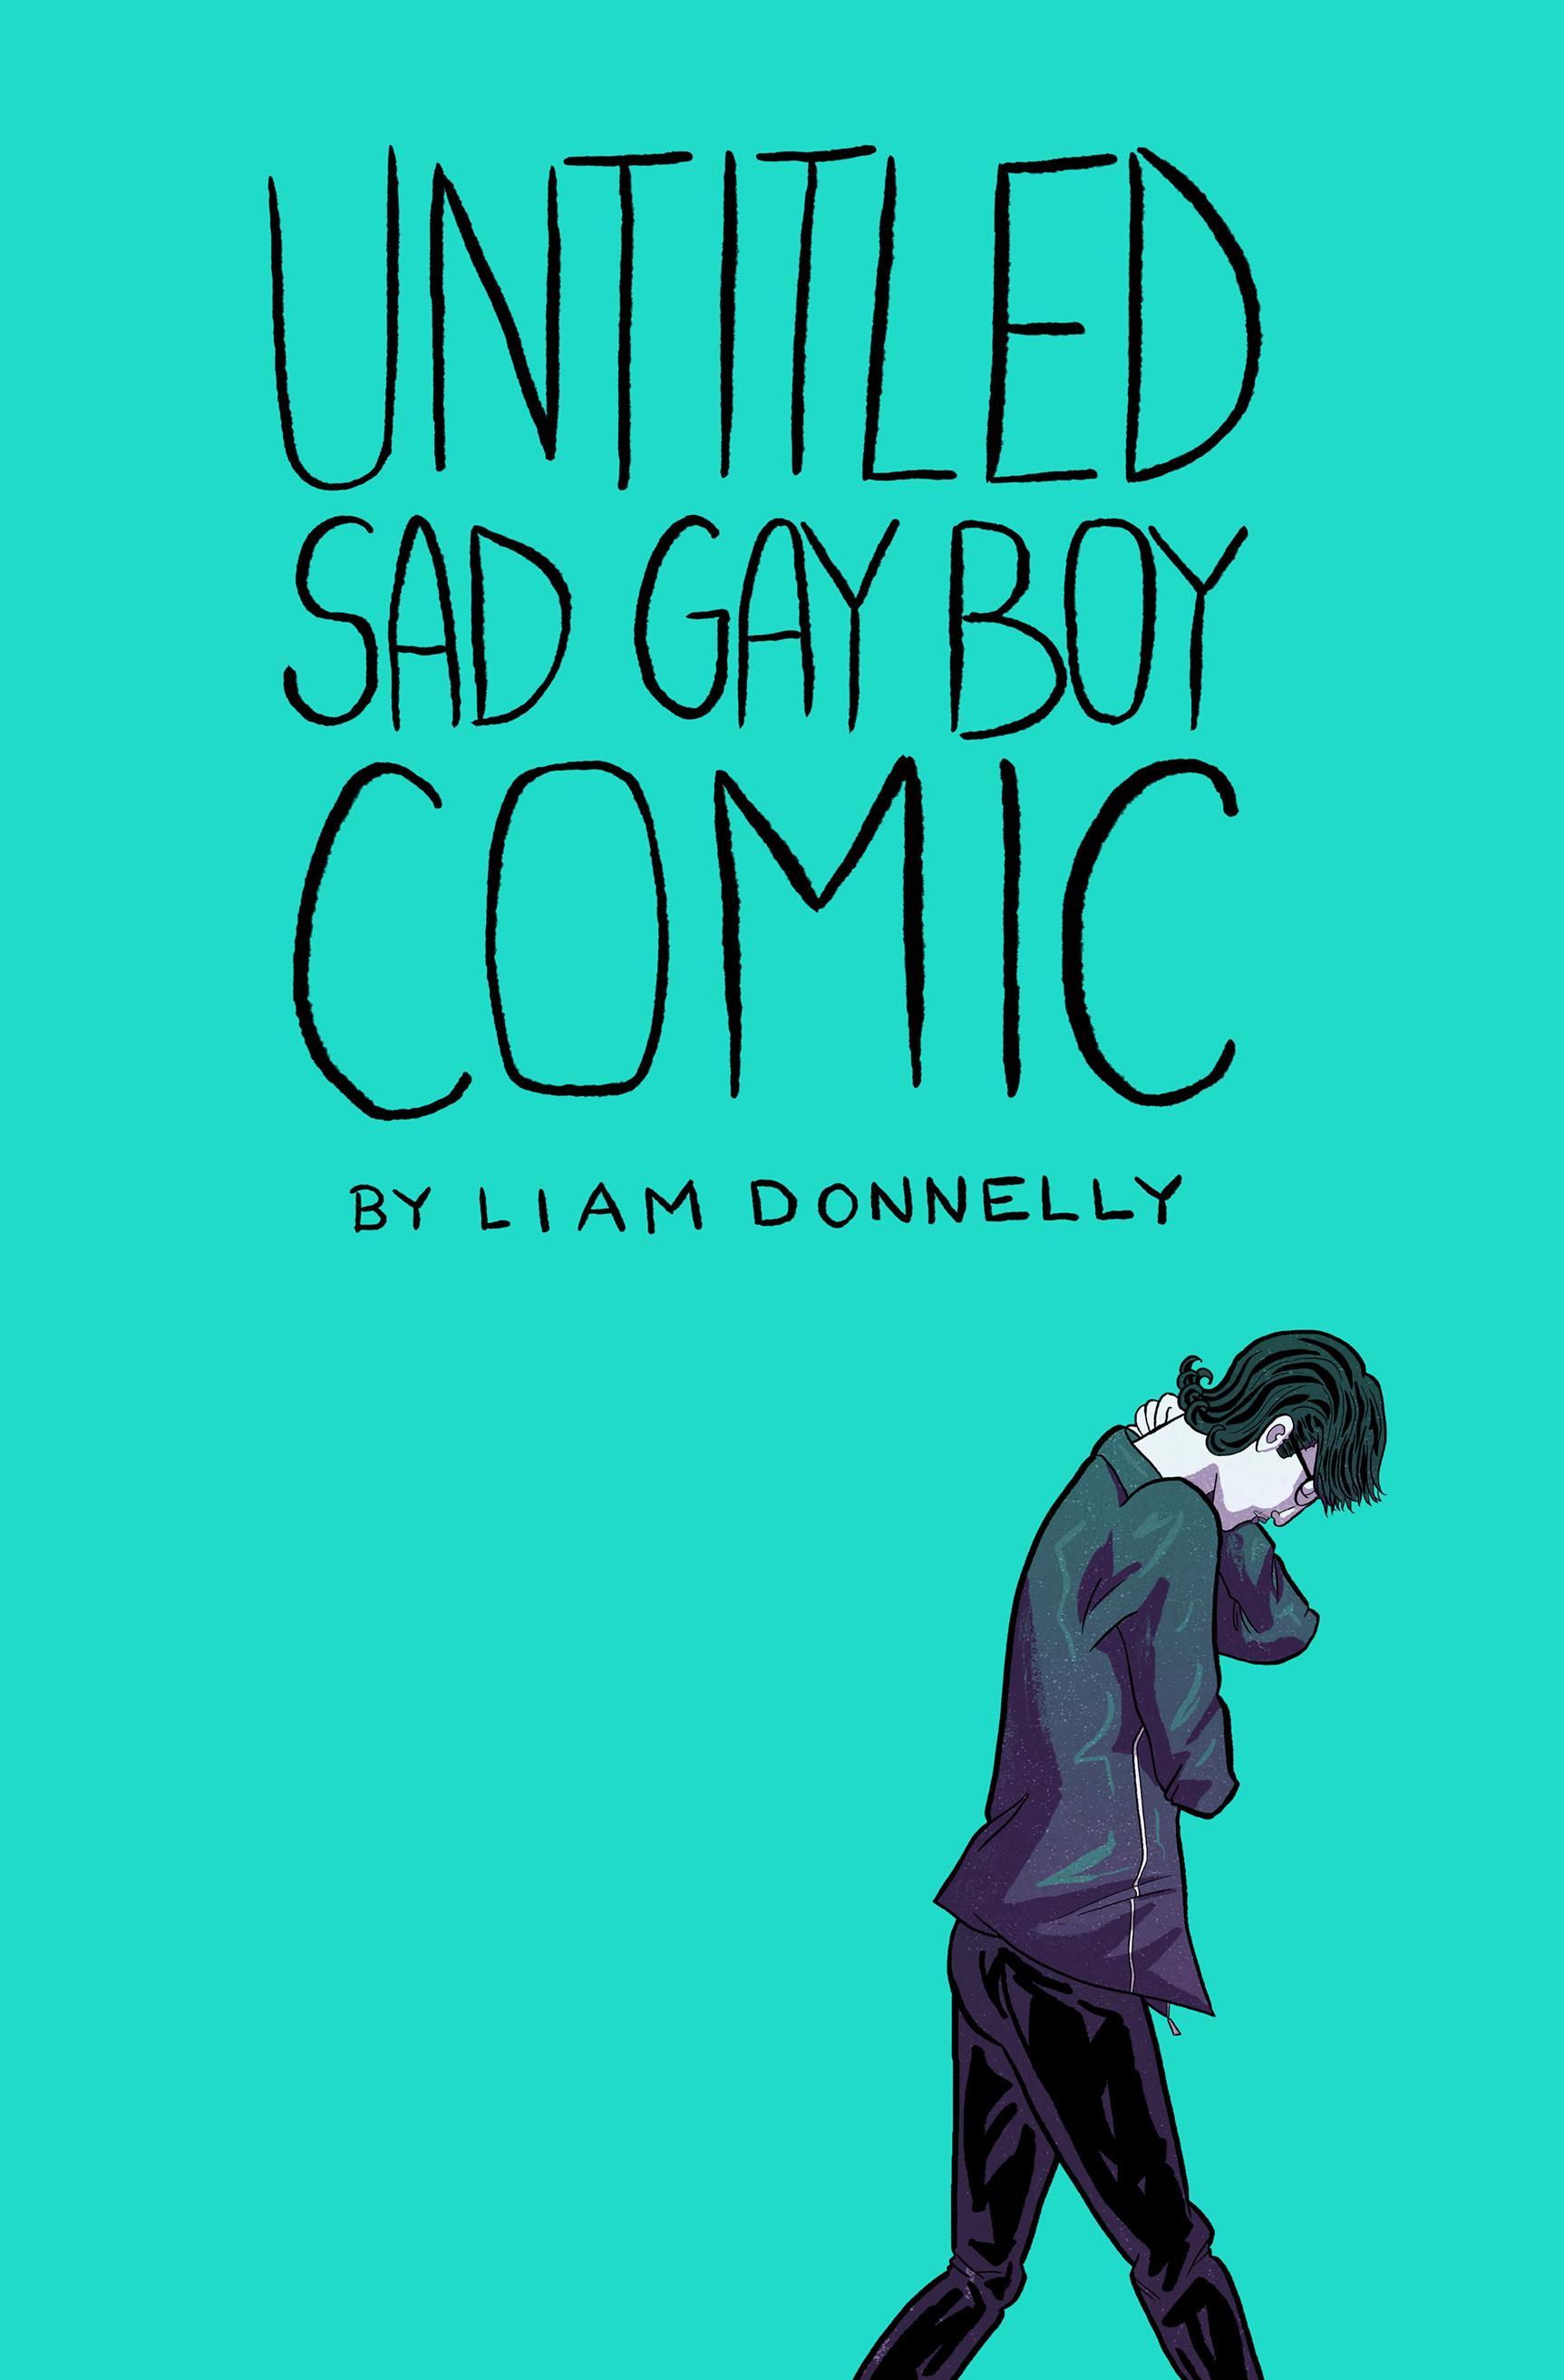 00Untitled Sad Gay Boy Comic - Cover.png